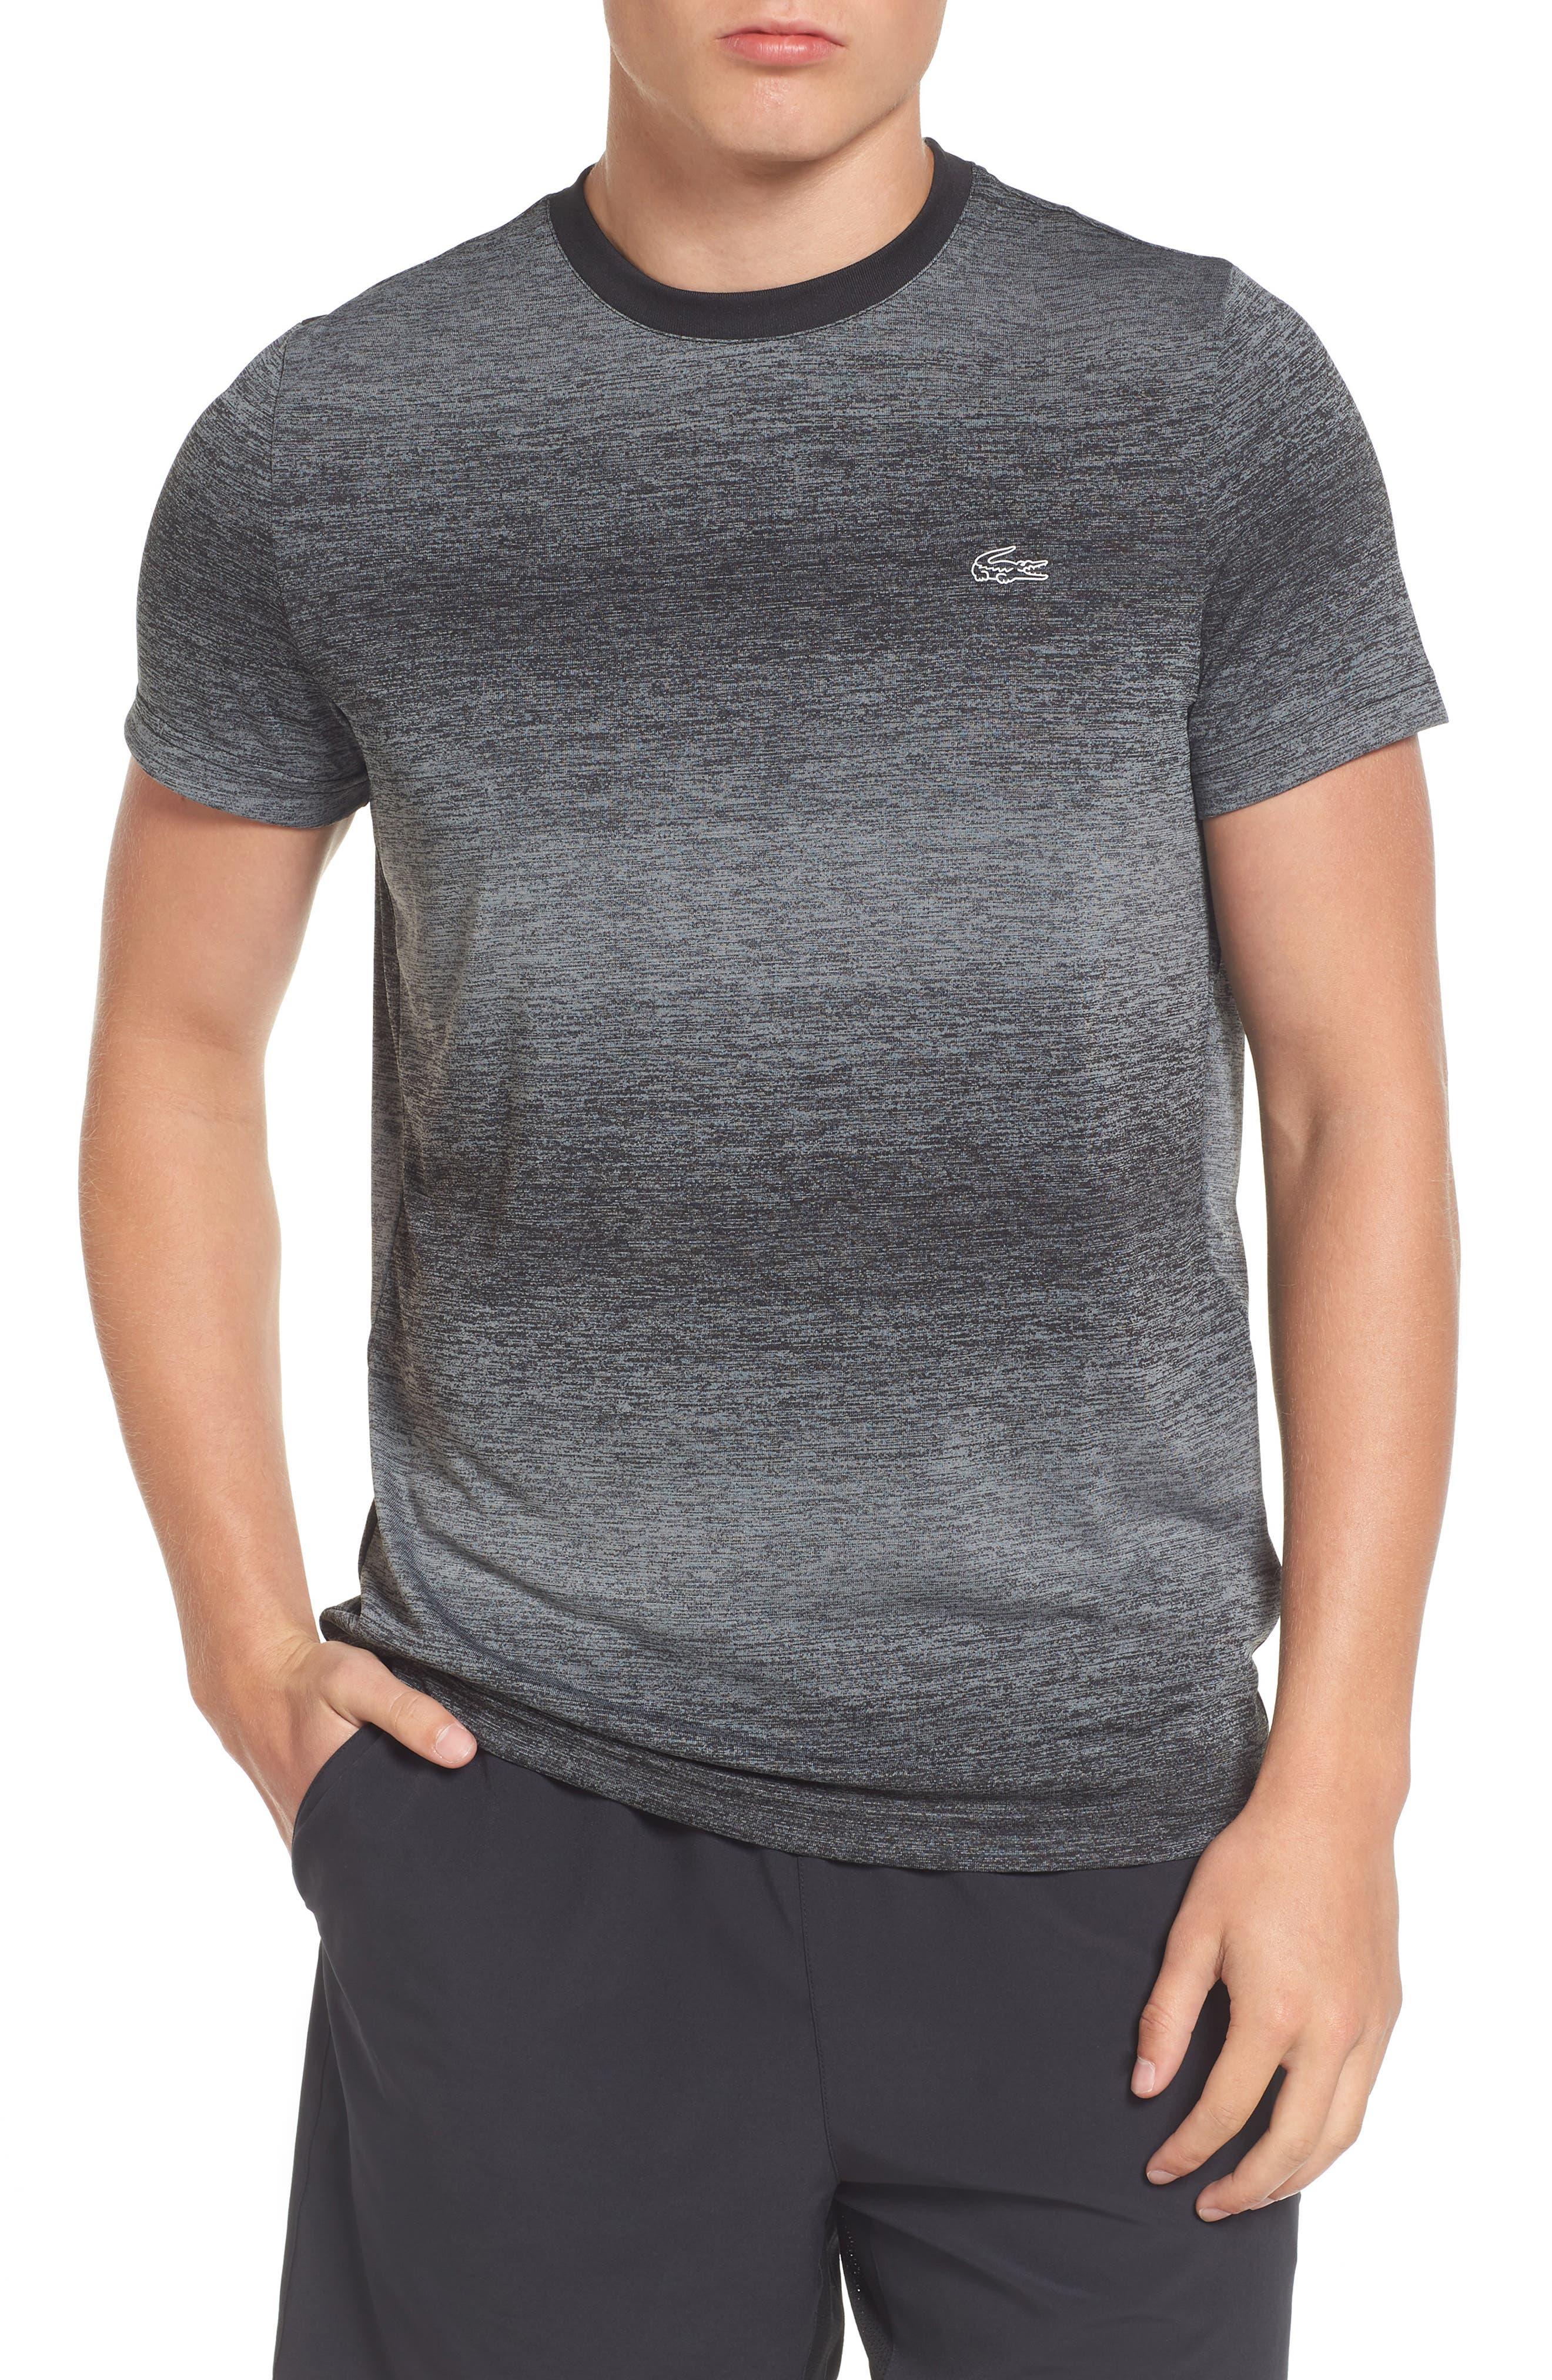 Main Image - Lacoste Ultra Dry Tech T-Shirt